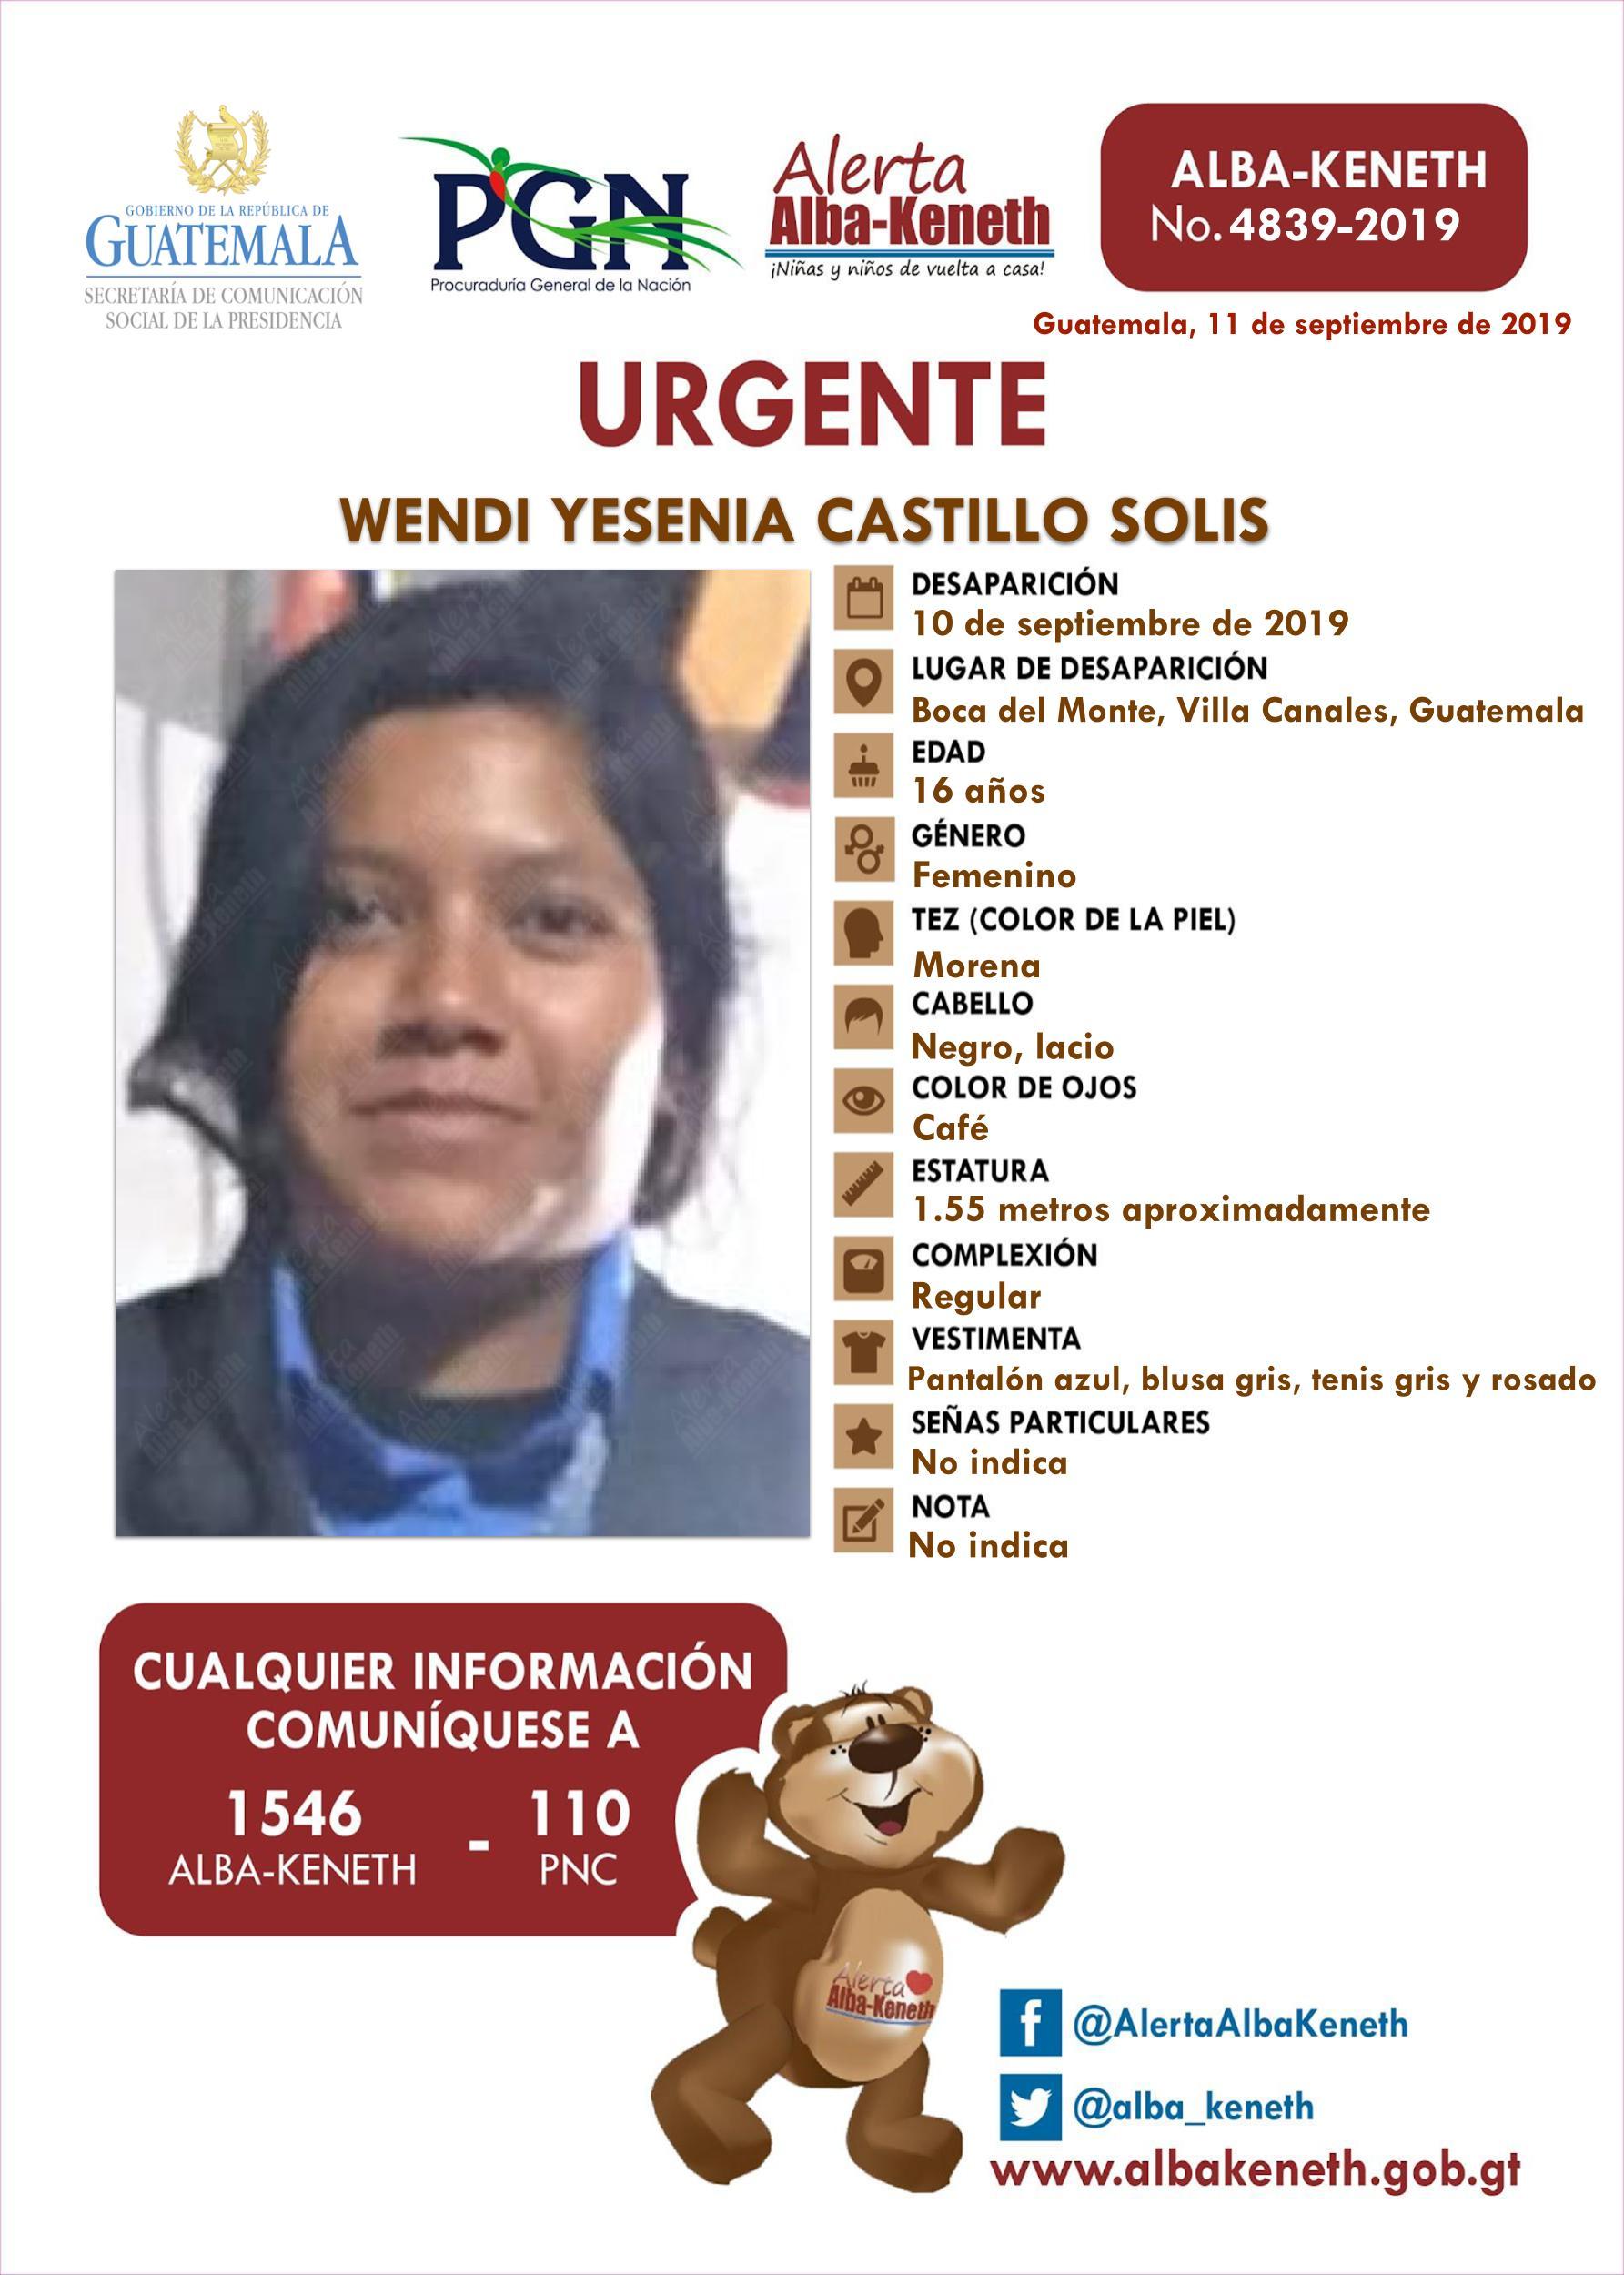 Wendi Yesenia Castillo Solis